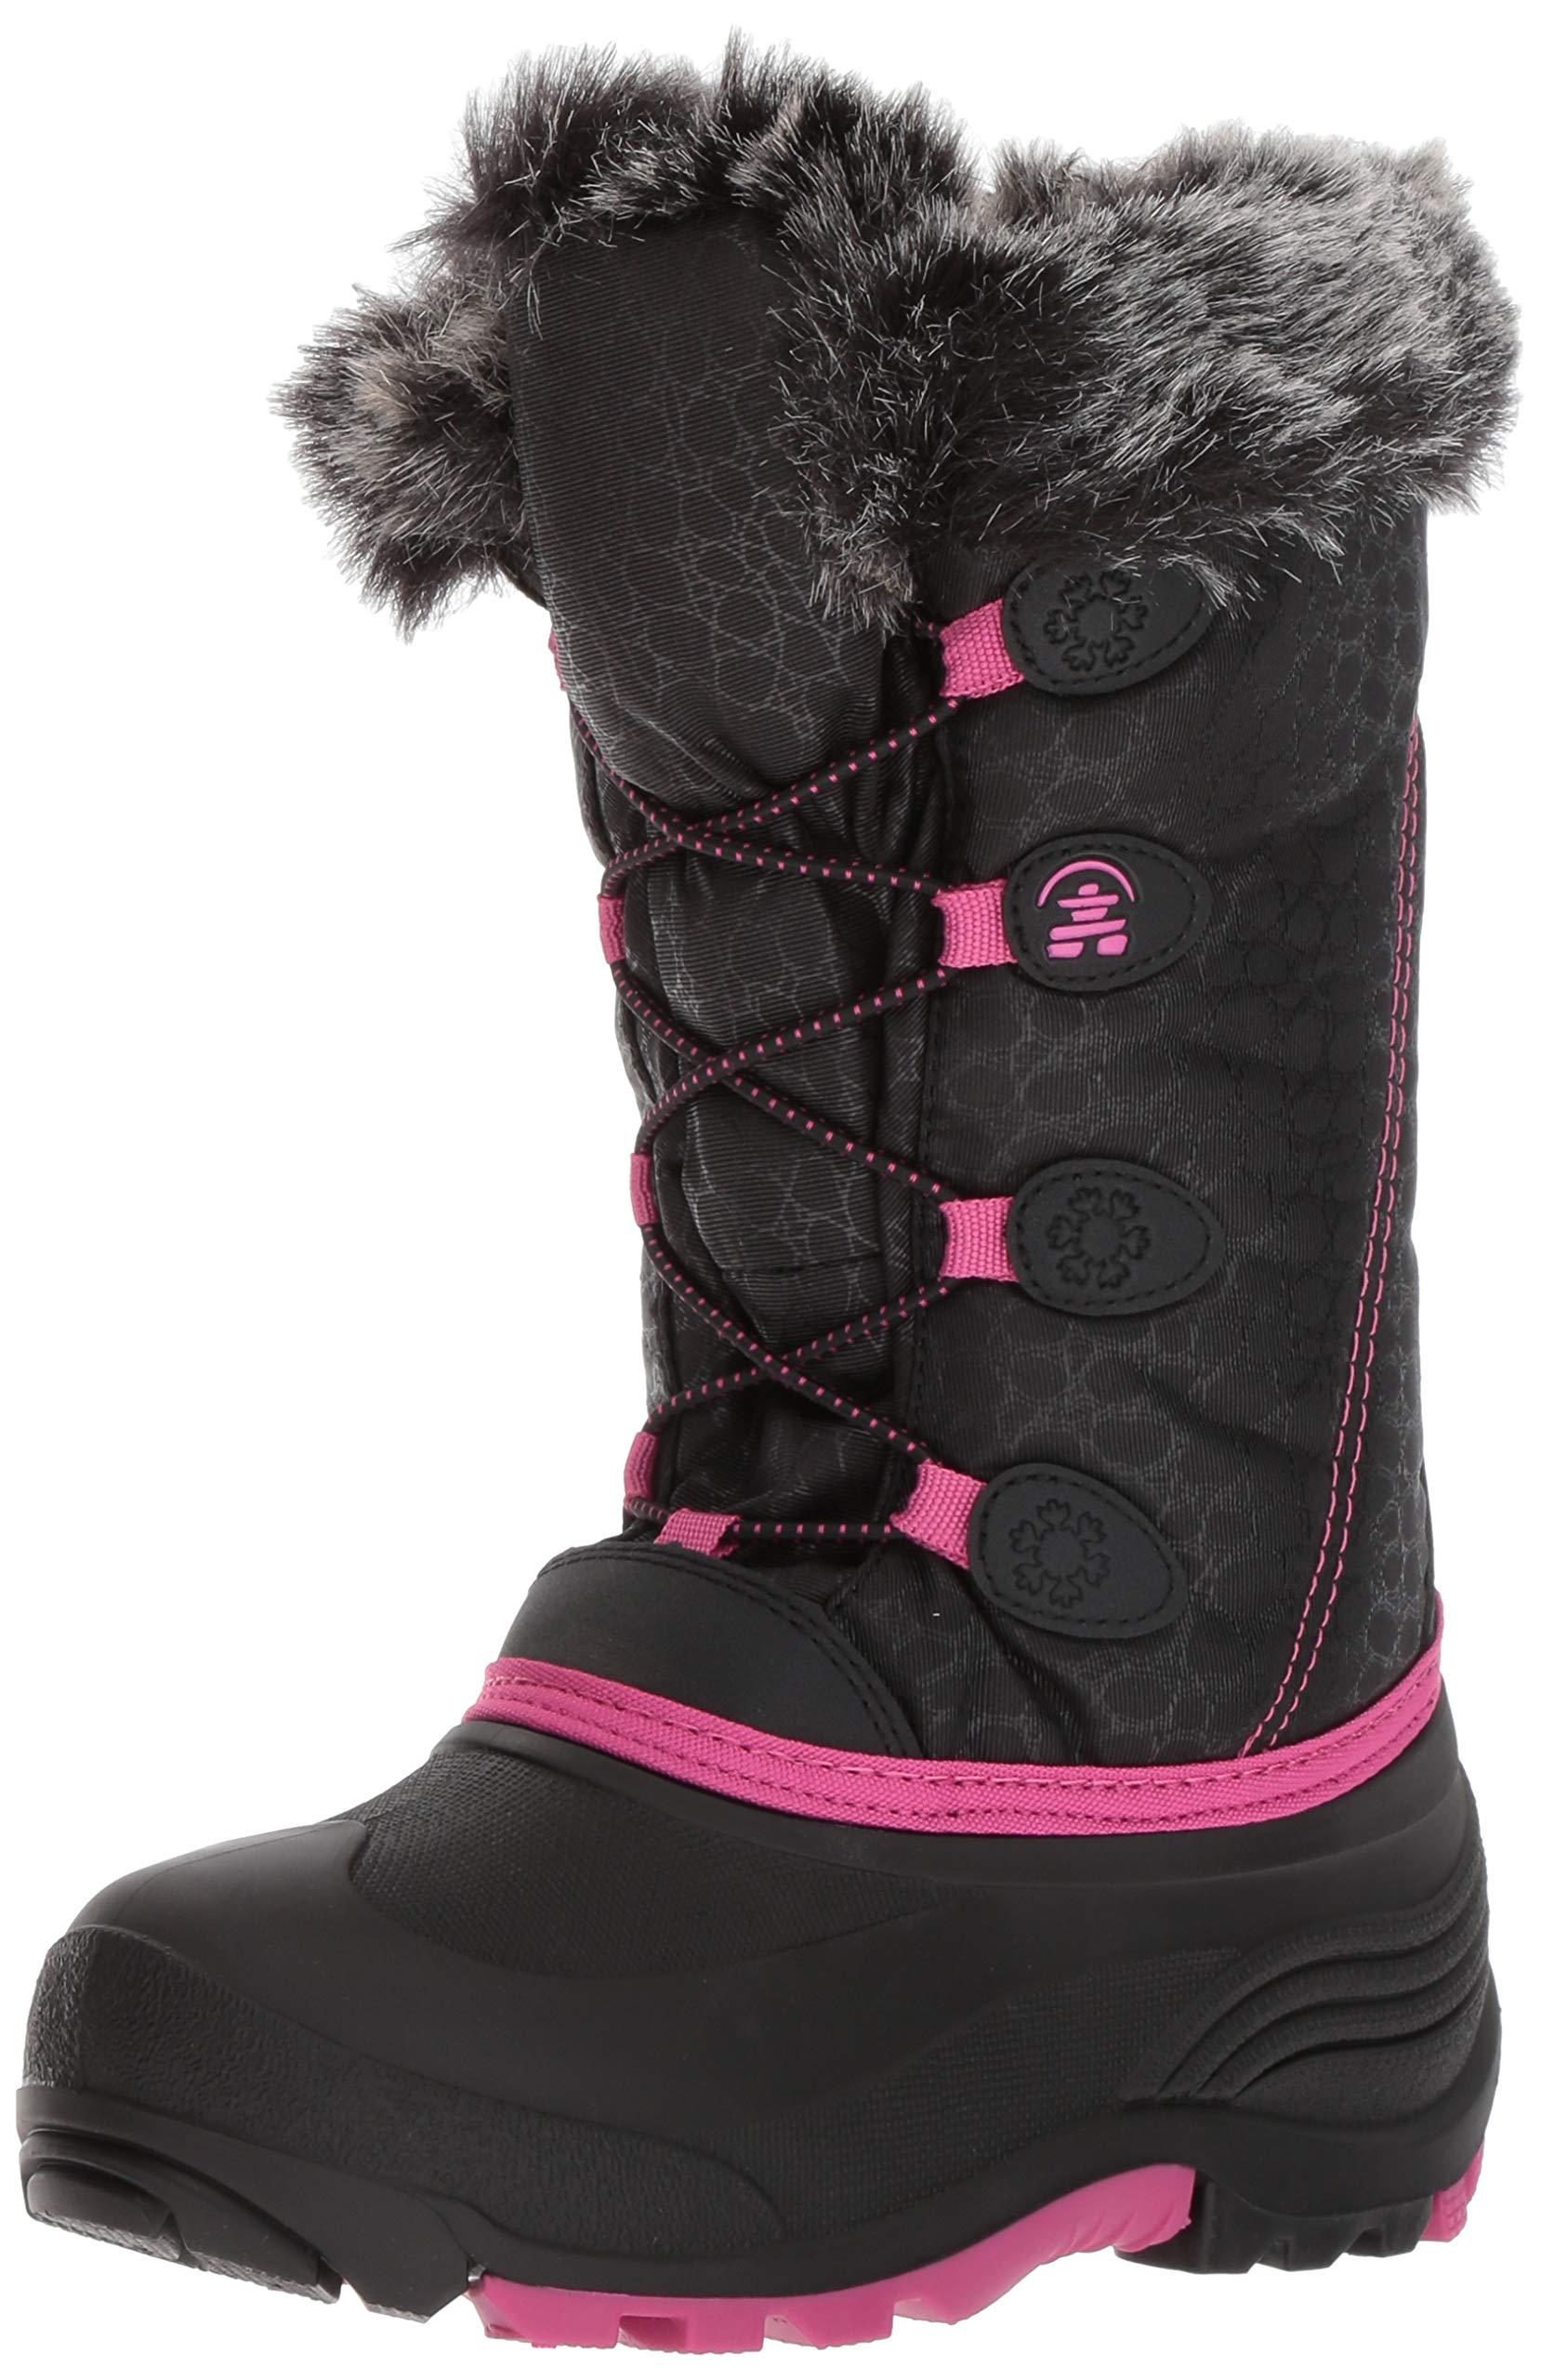 Kamik Kids' Snowgypsy Snow Boot, Black/Magenta/Bmm, 3 Medium US Little Kid